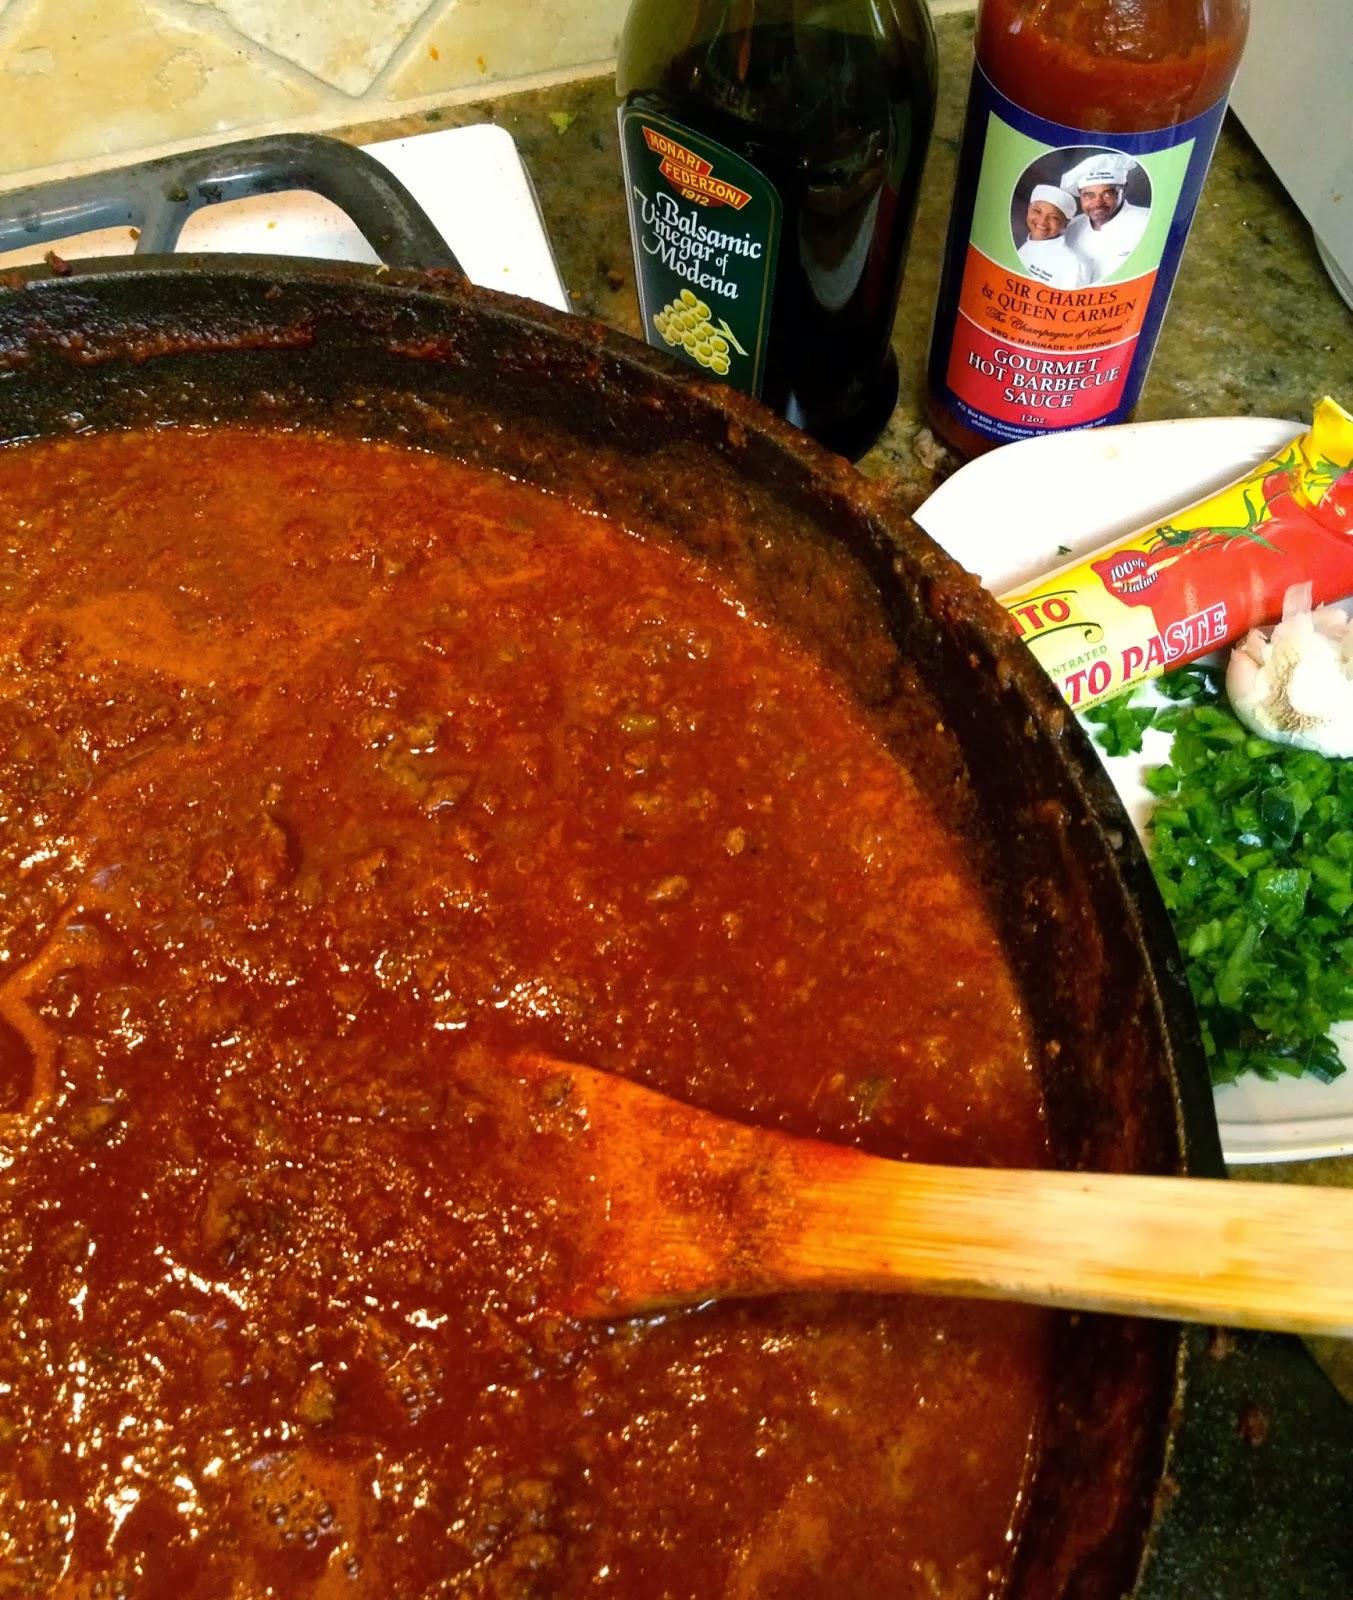 A Southern Soul | Chili Sauce